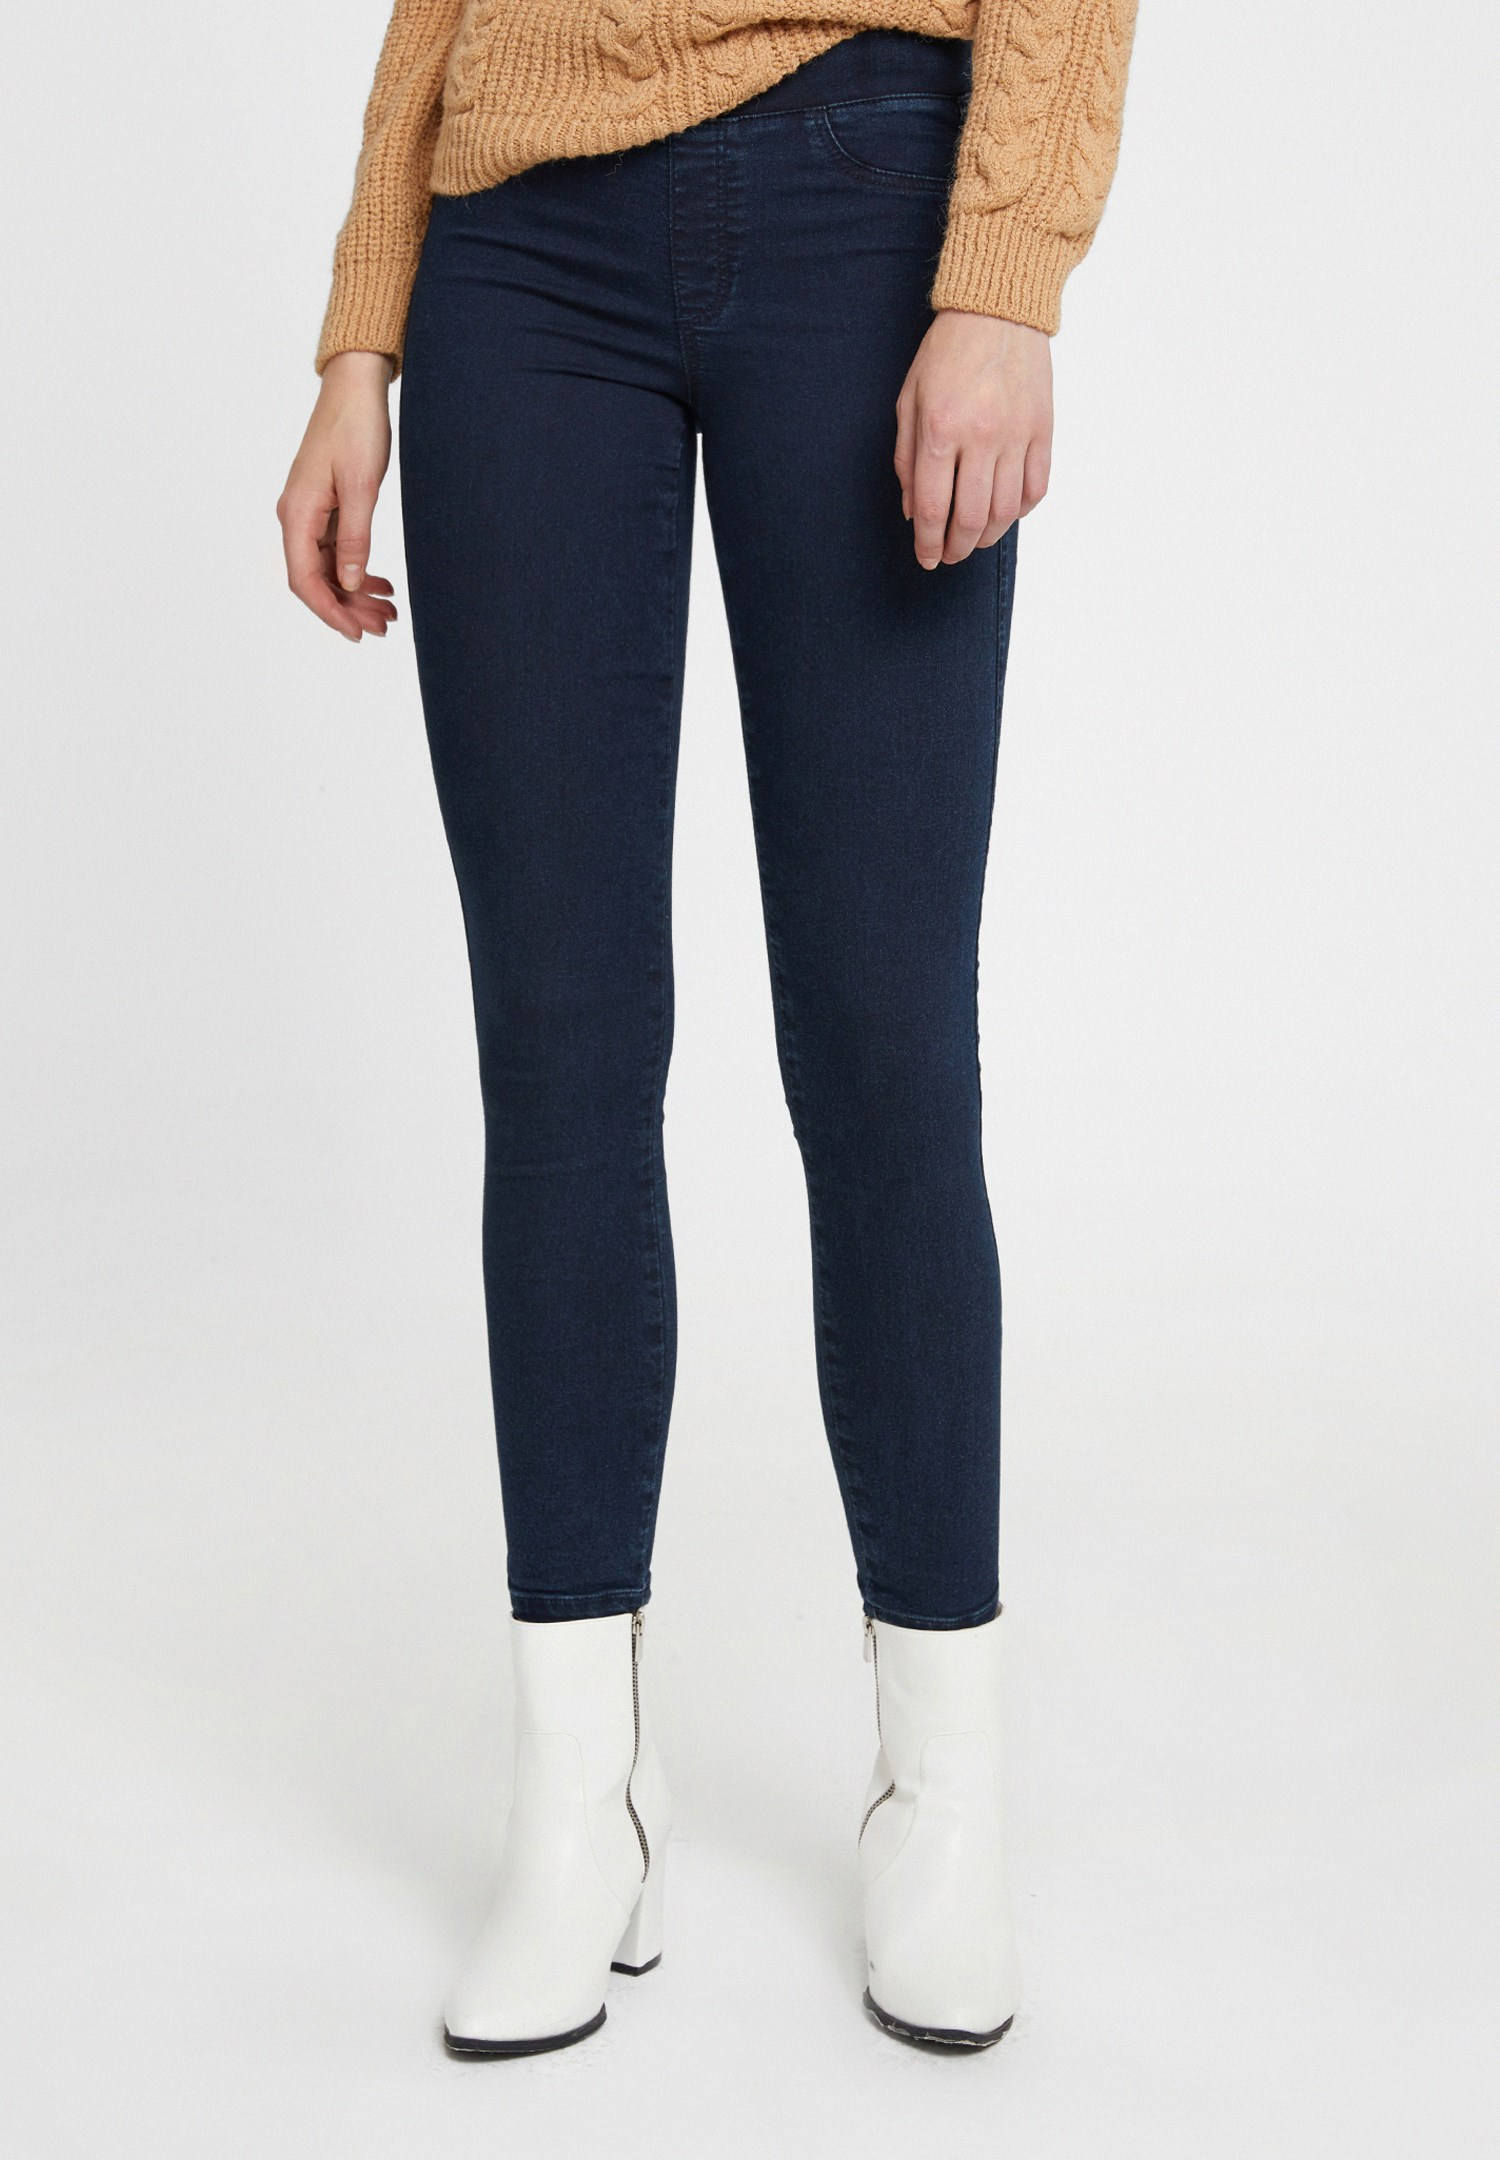 Bayan Mavi Lastikli Orta Bel Tayt Pantolon